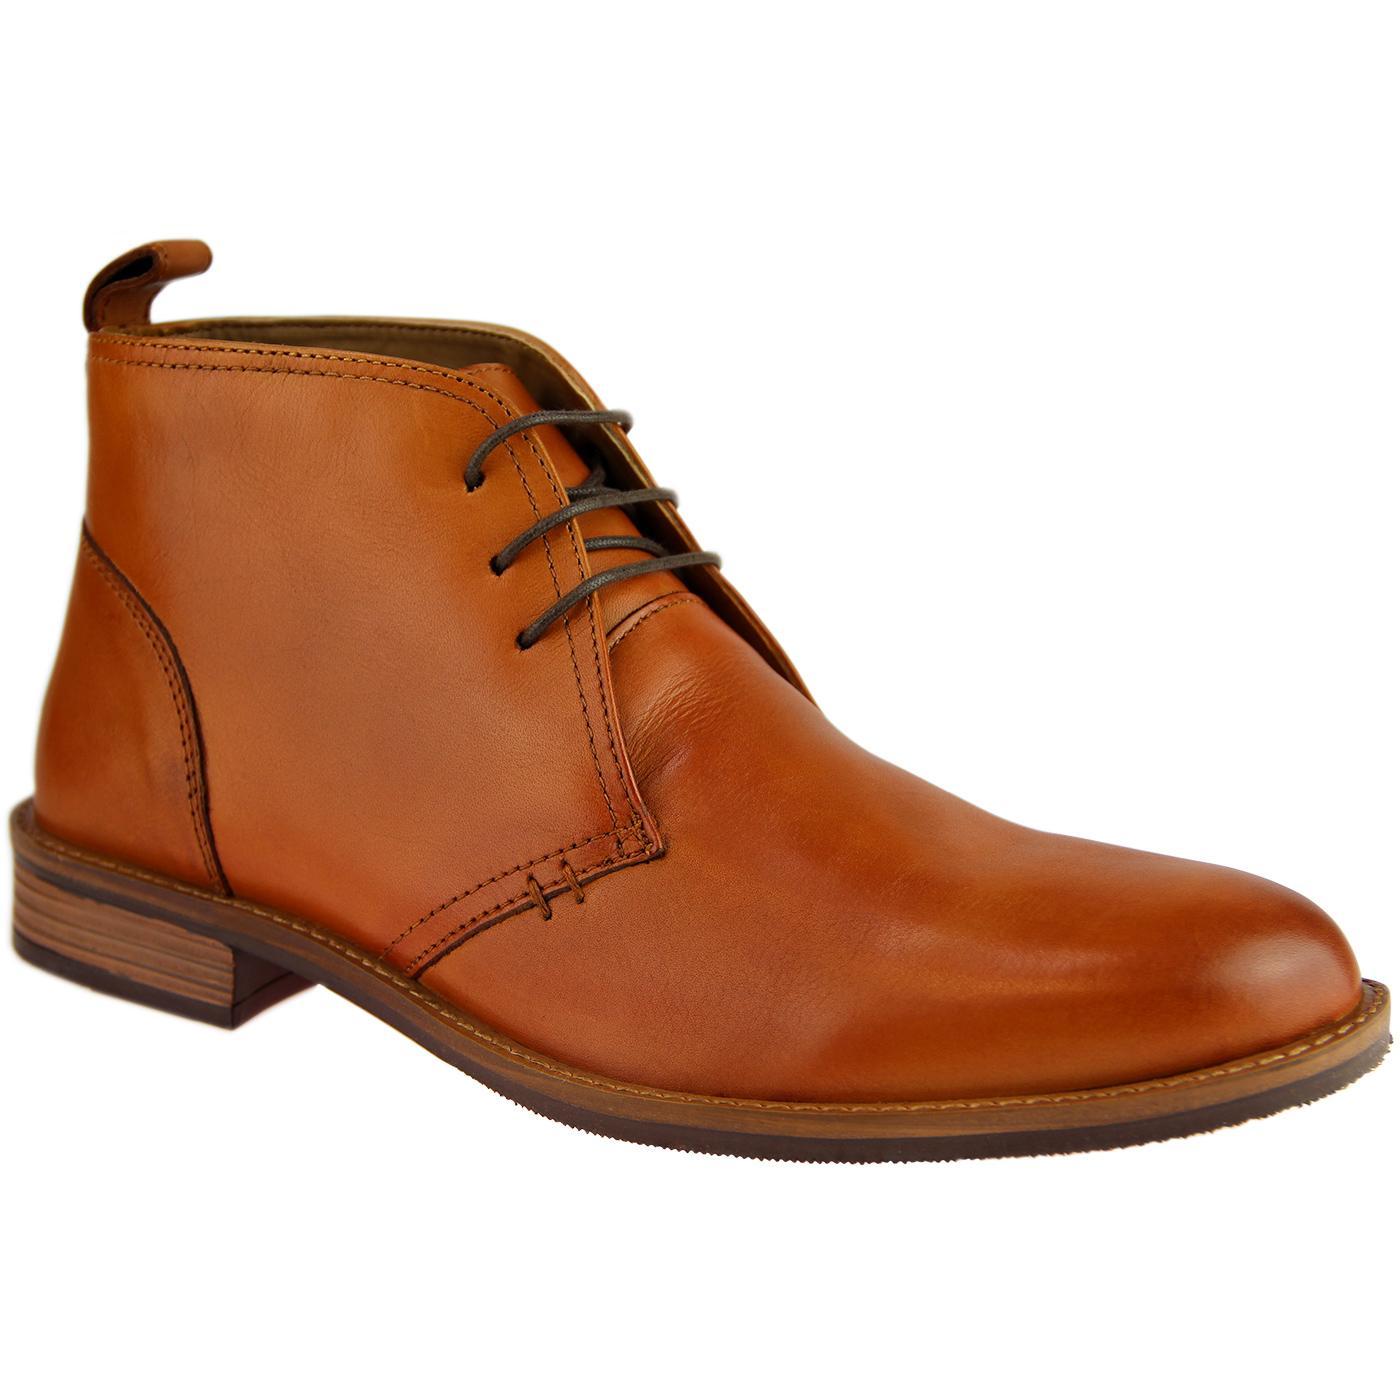 Men's Retro Indie Mod Leather Desert Boot (Tan)